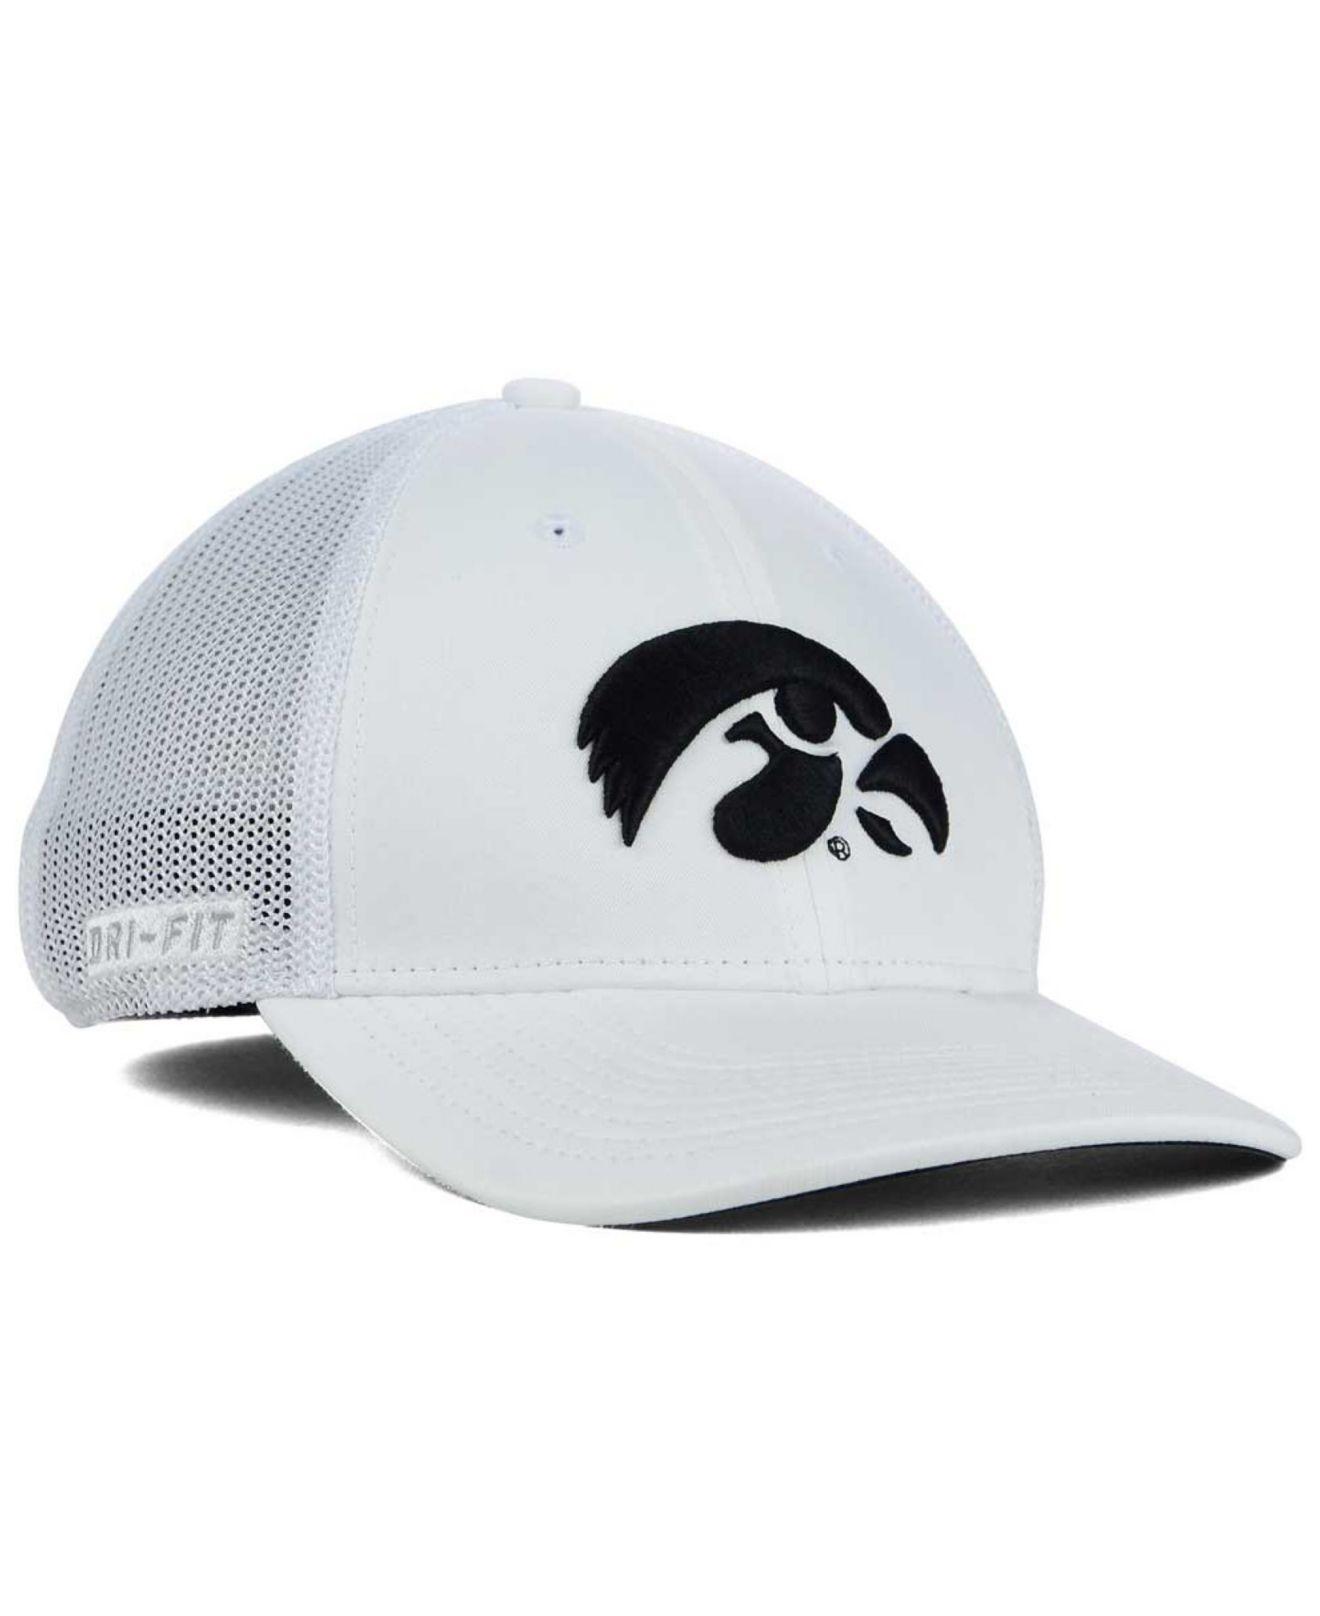 best cheap c38d3 c5e30 Nike Iowa Hawkeyes L91 Mesh Swoosh Flex Cap in White for Men - Lyst